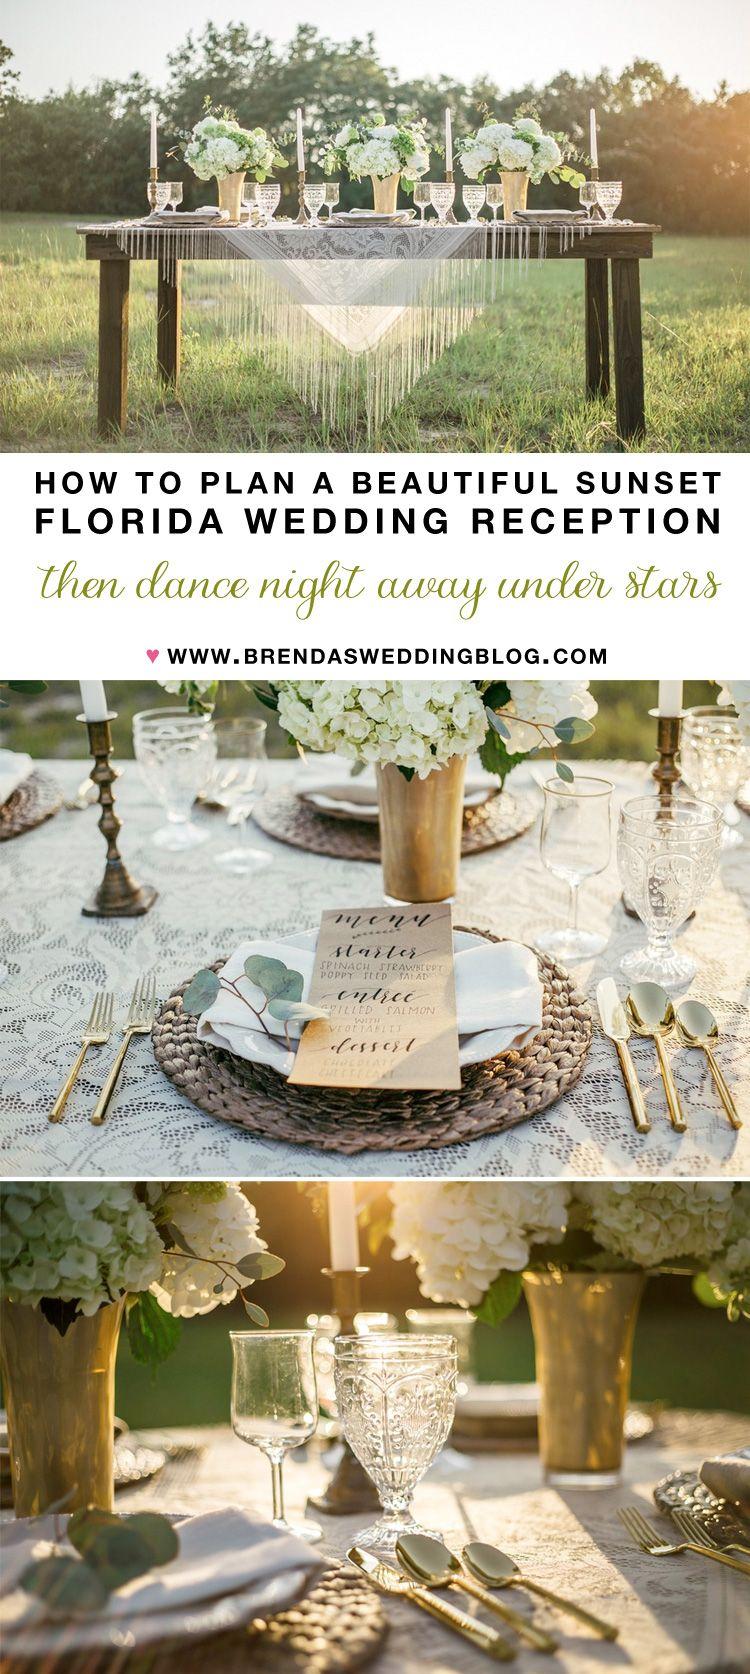 how to plan a beautiful sunset florida wedding reception wedding